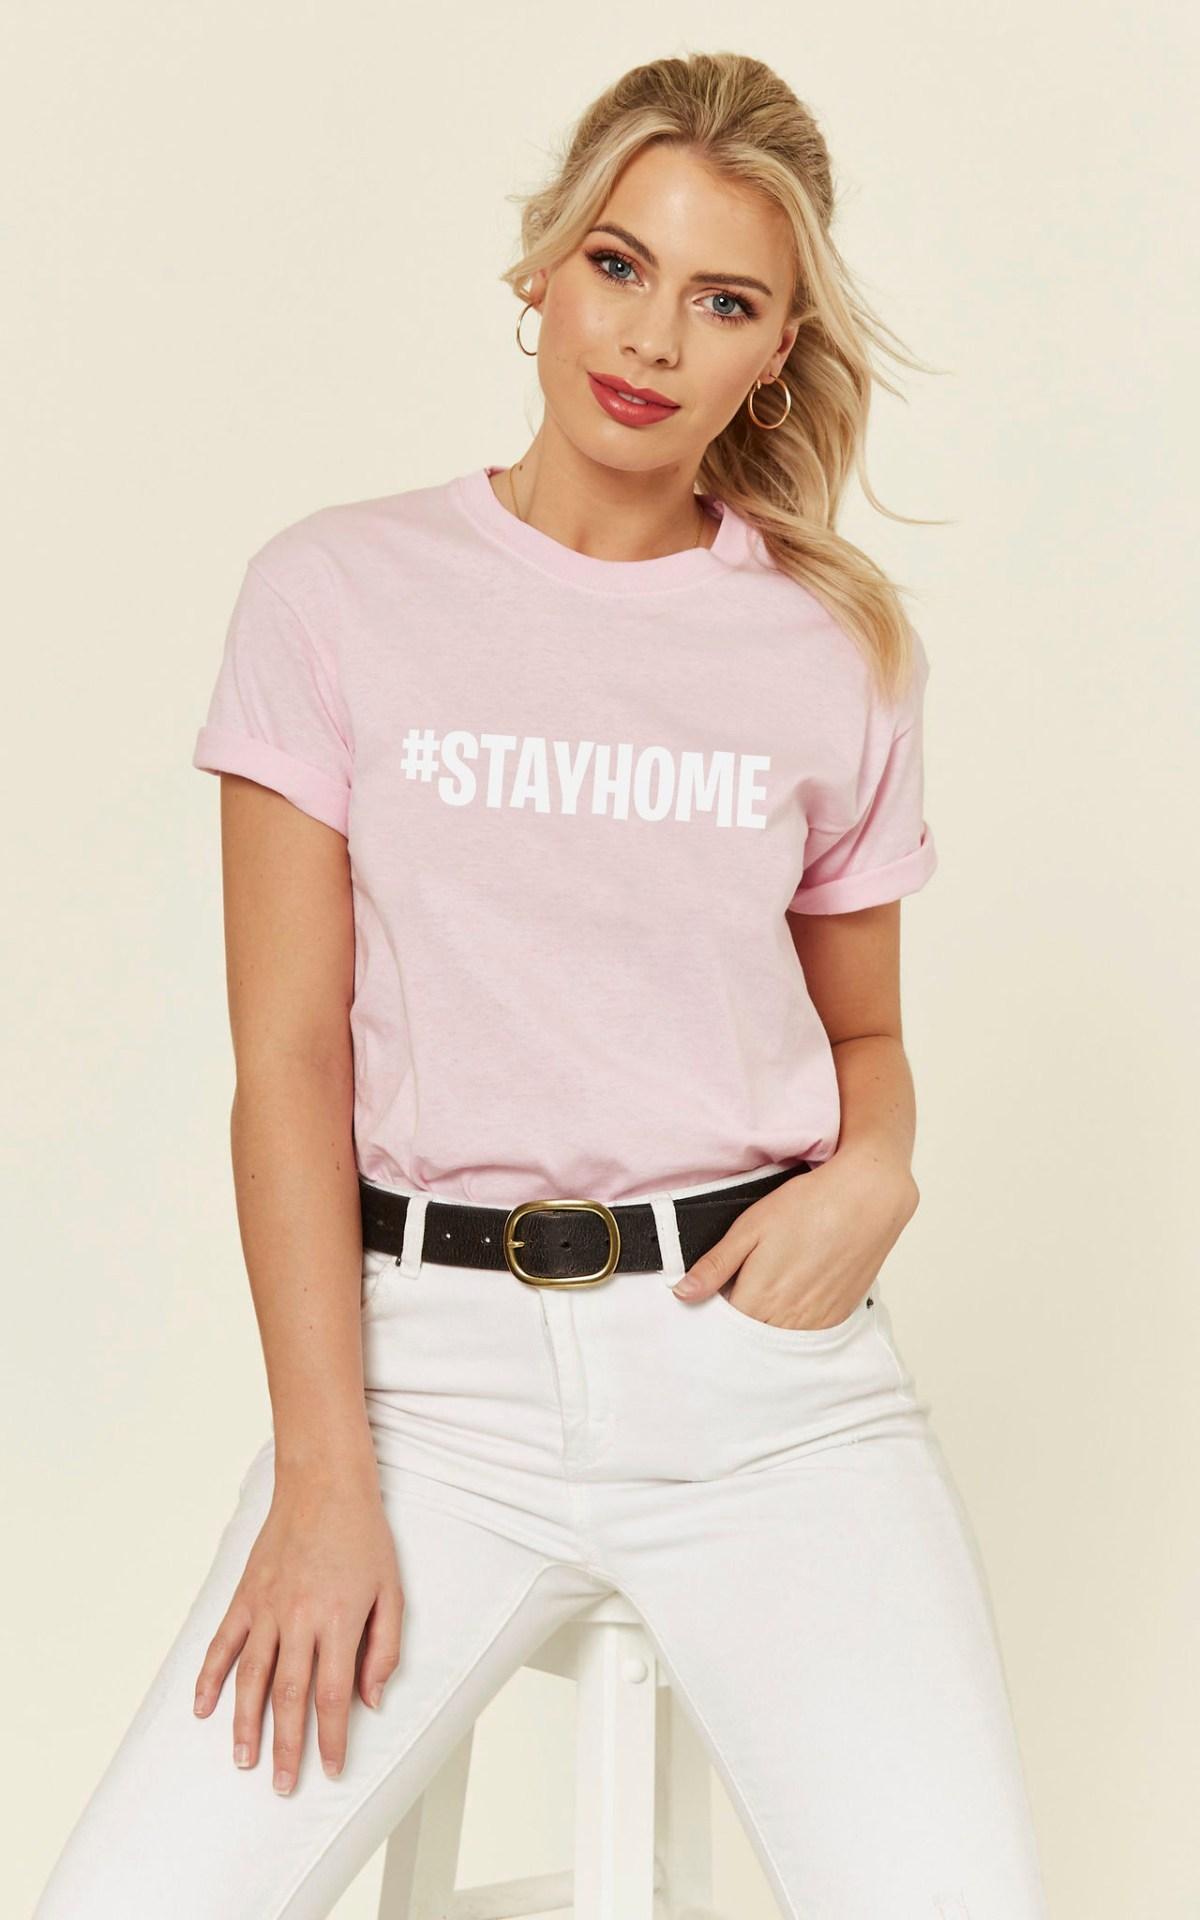 Social Distancing #stayhome Slogan Tshirt in Pink